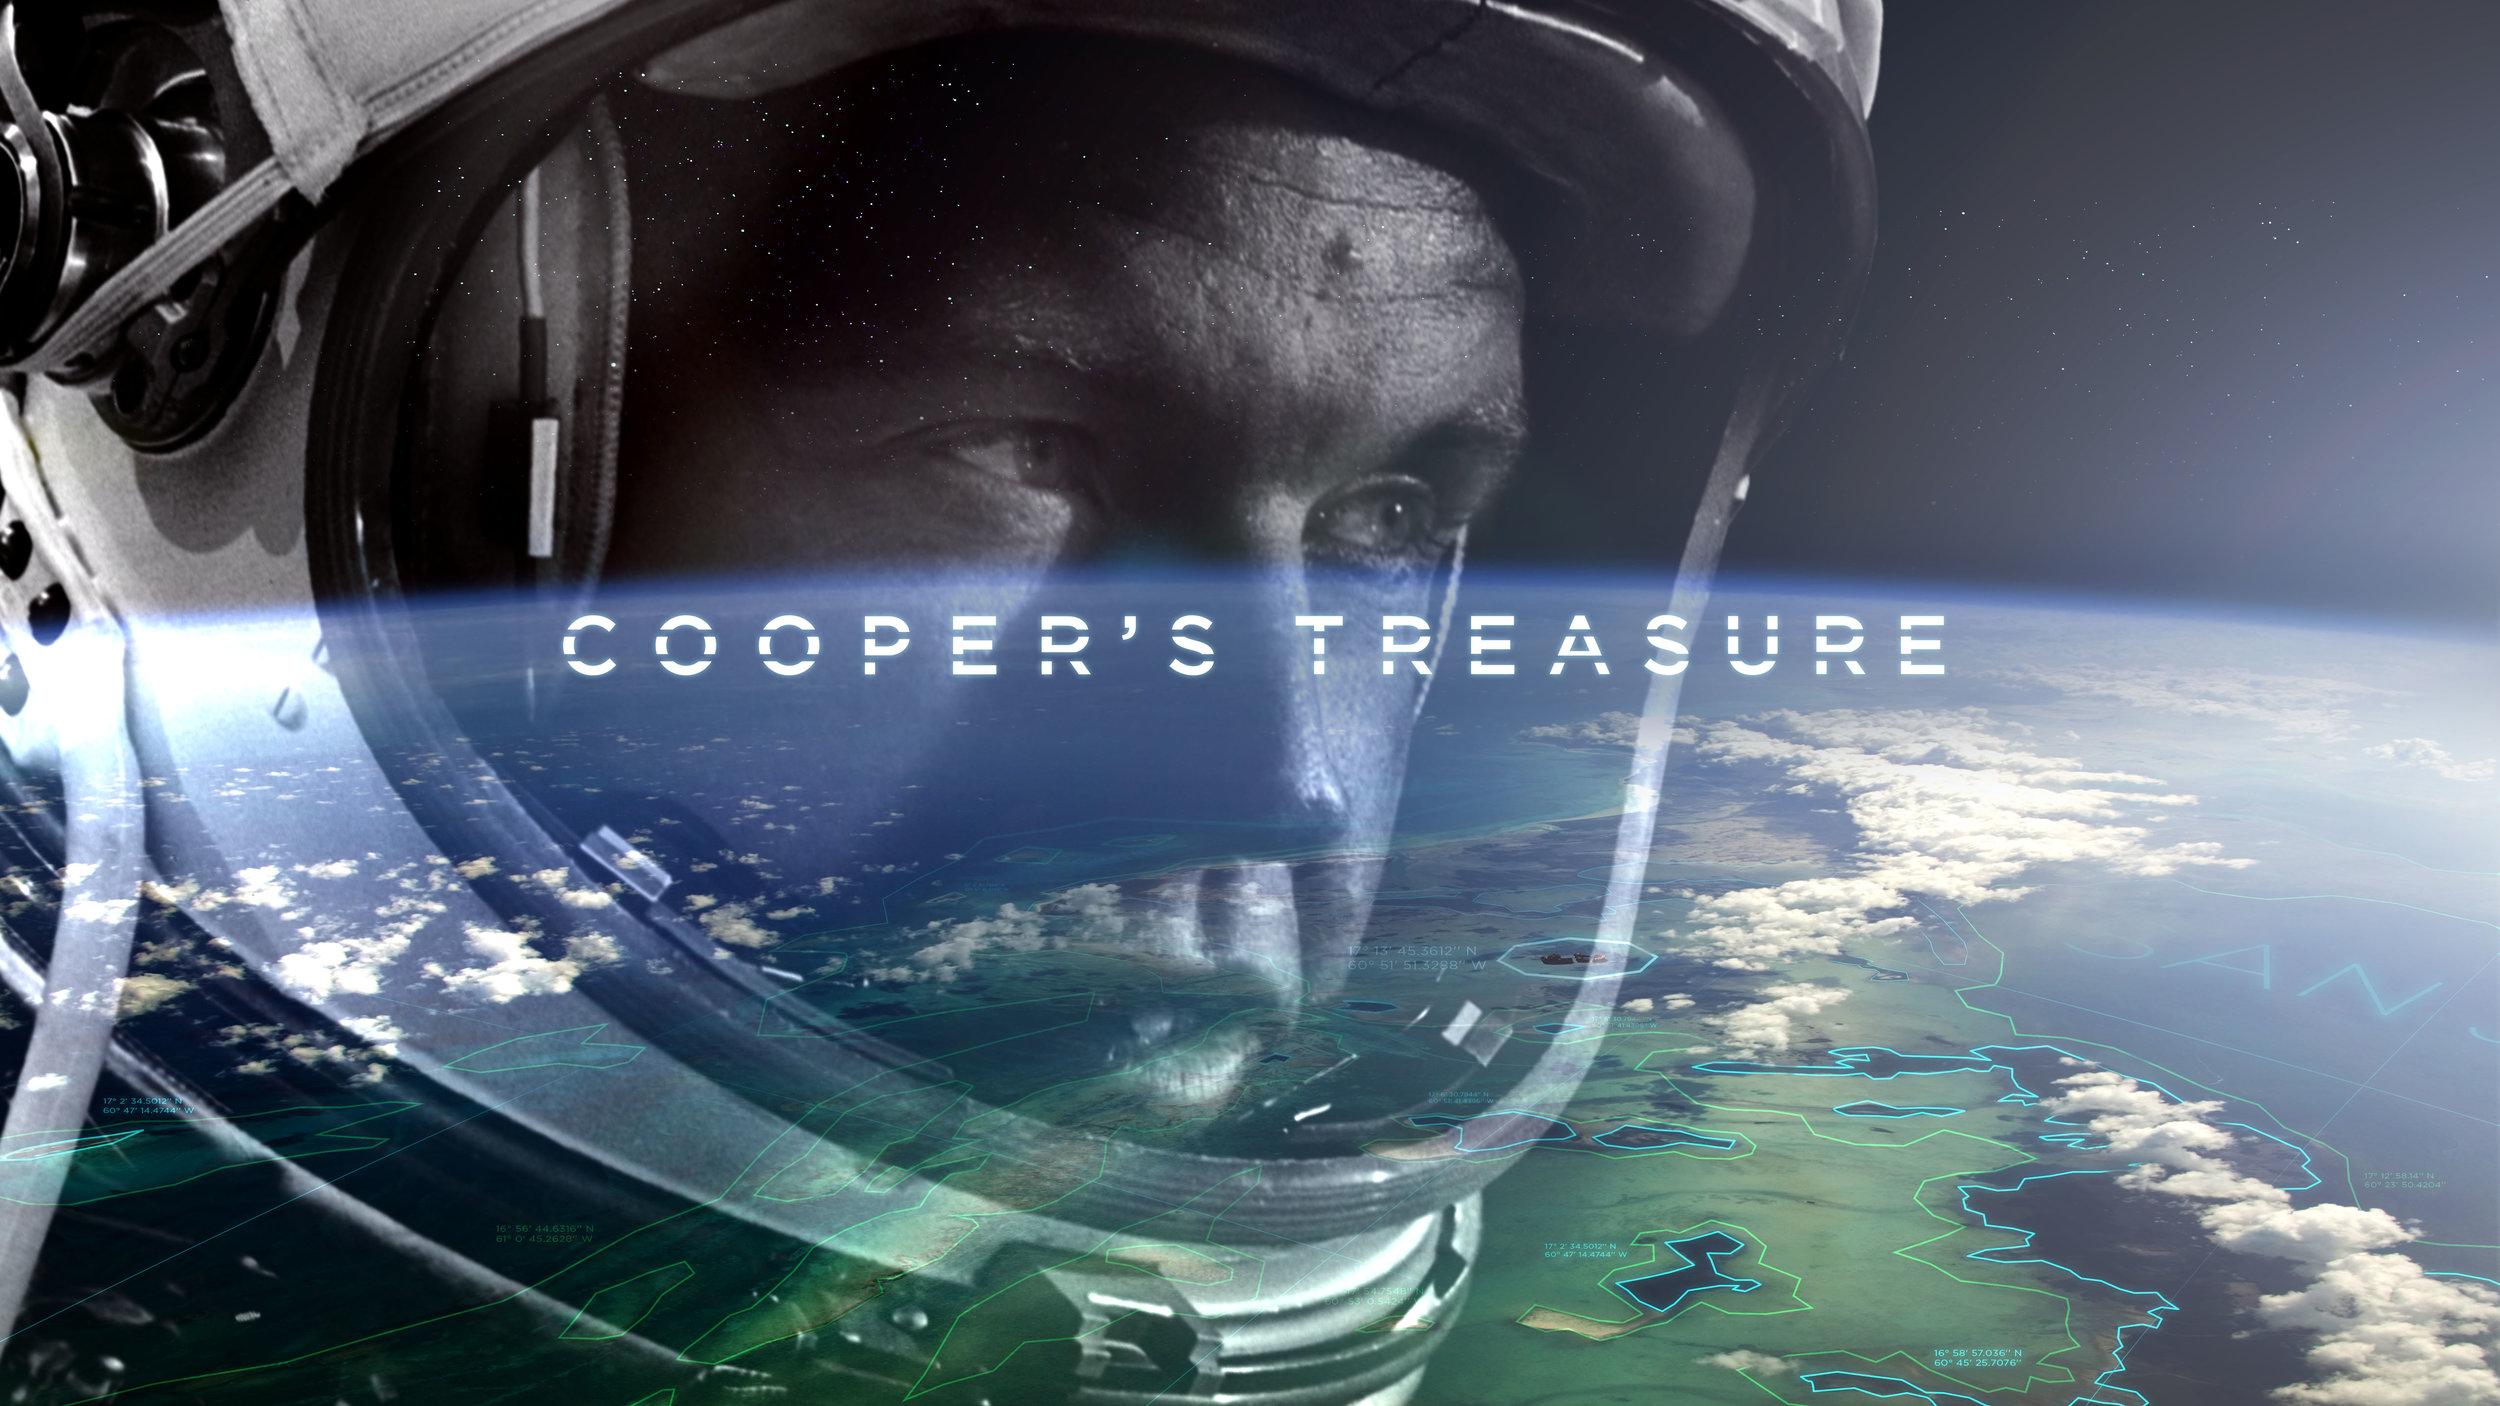 DCUK_COOPERS TREASURE_Key Art_Title.jpg